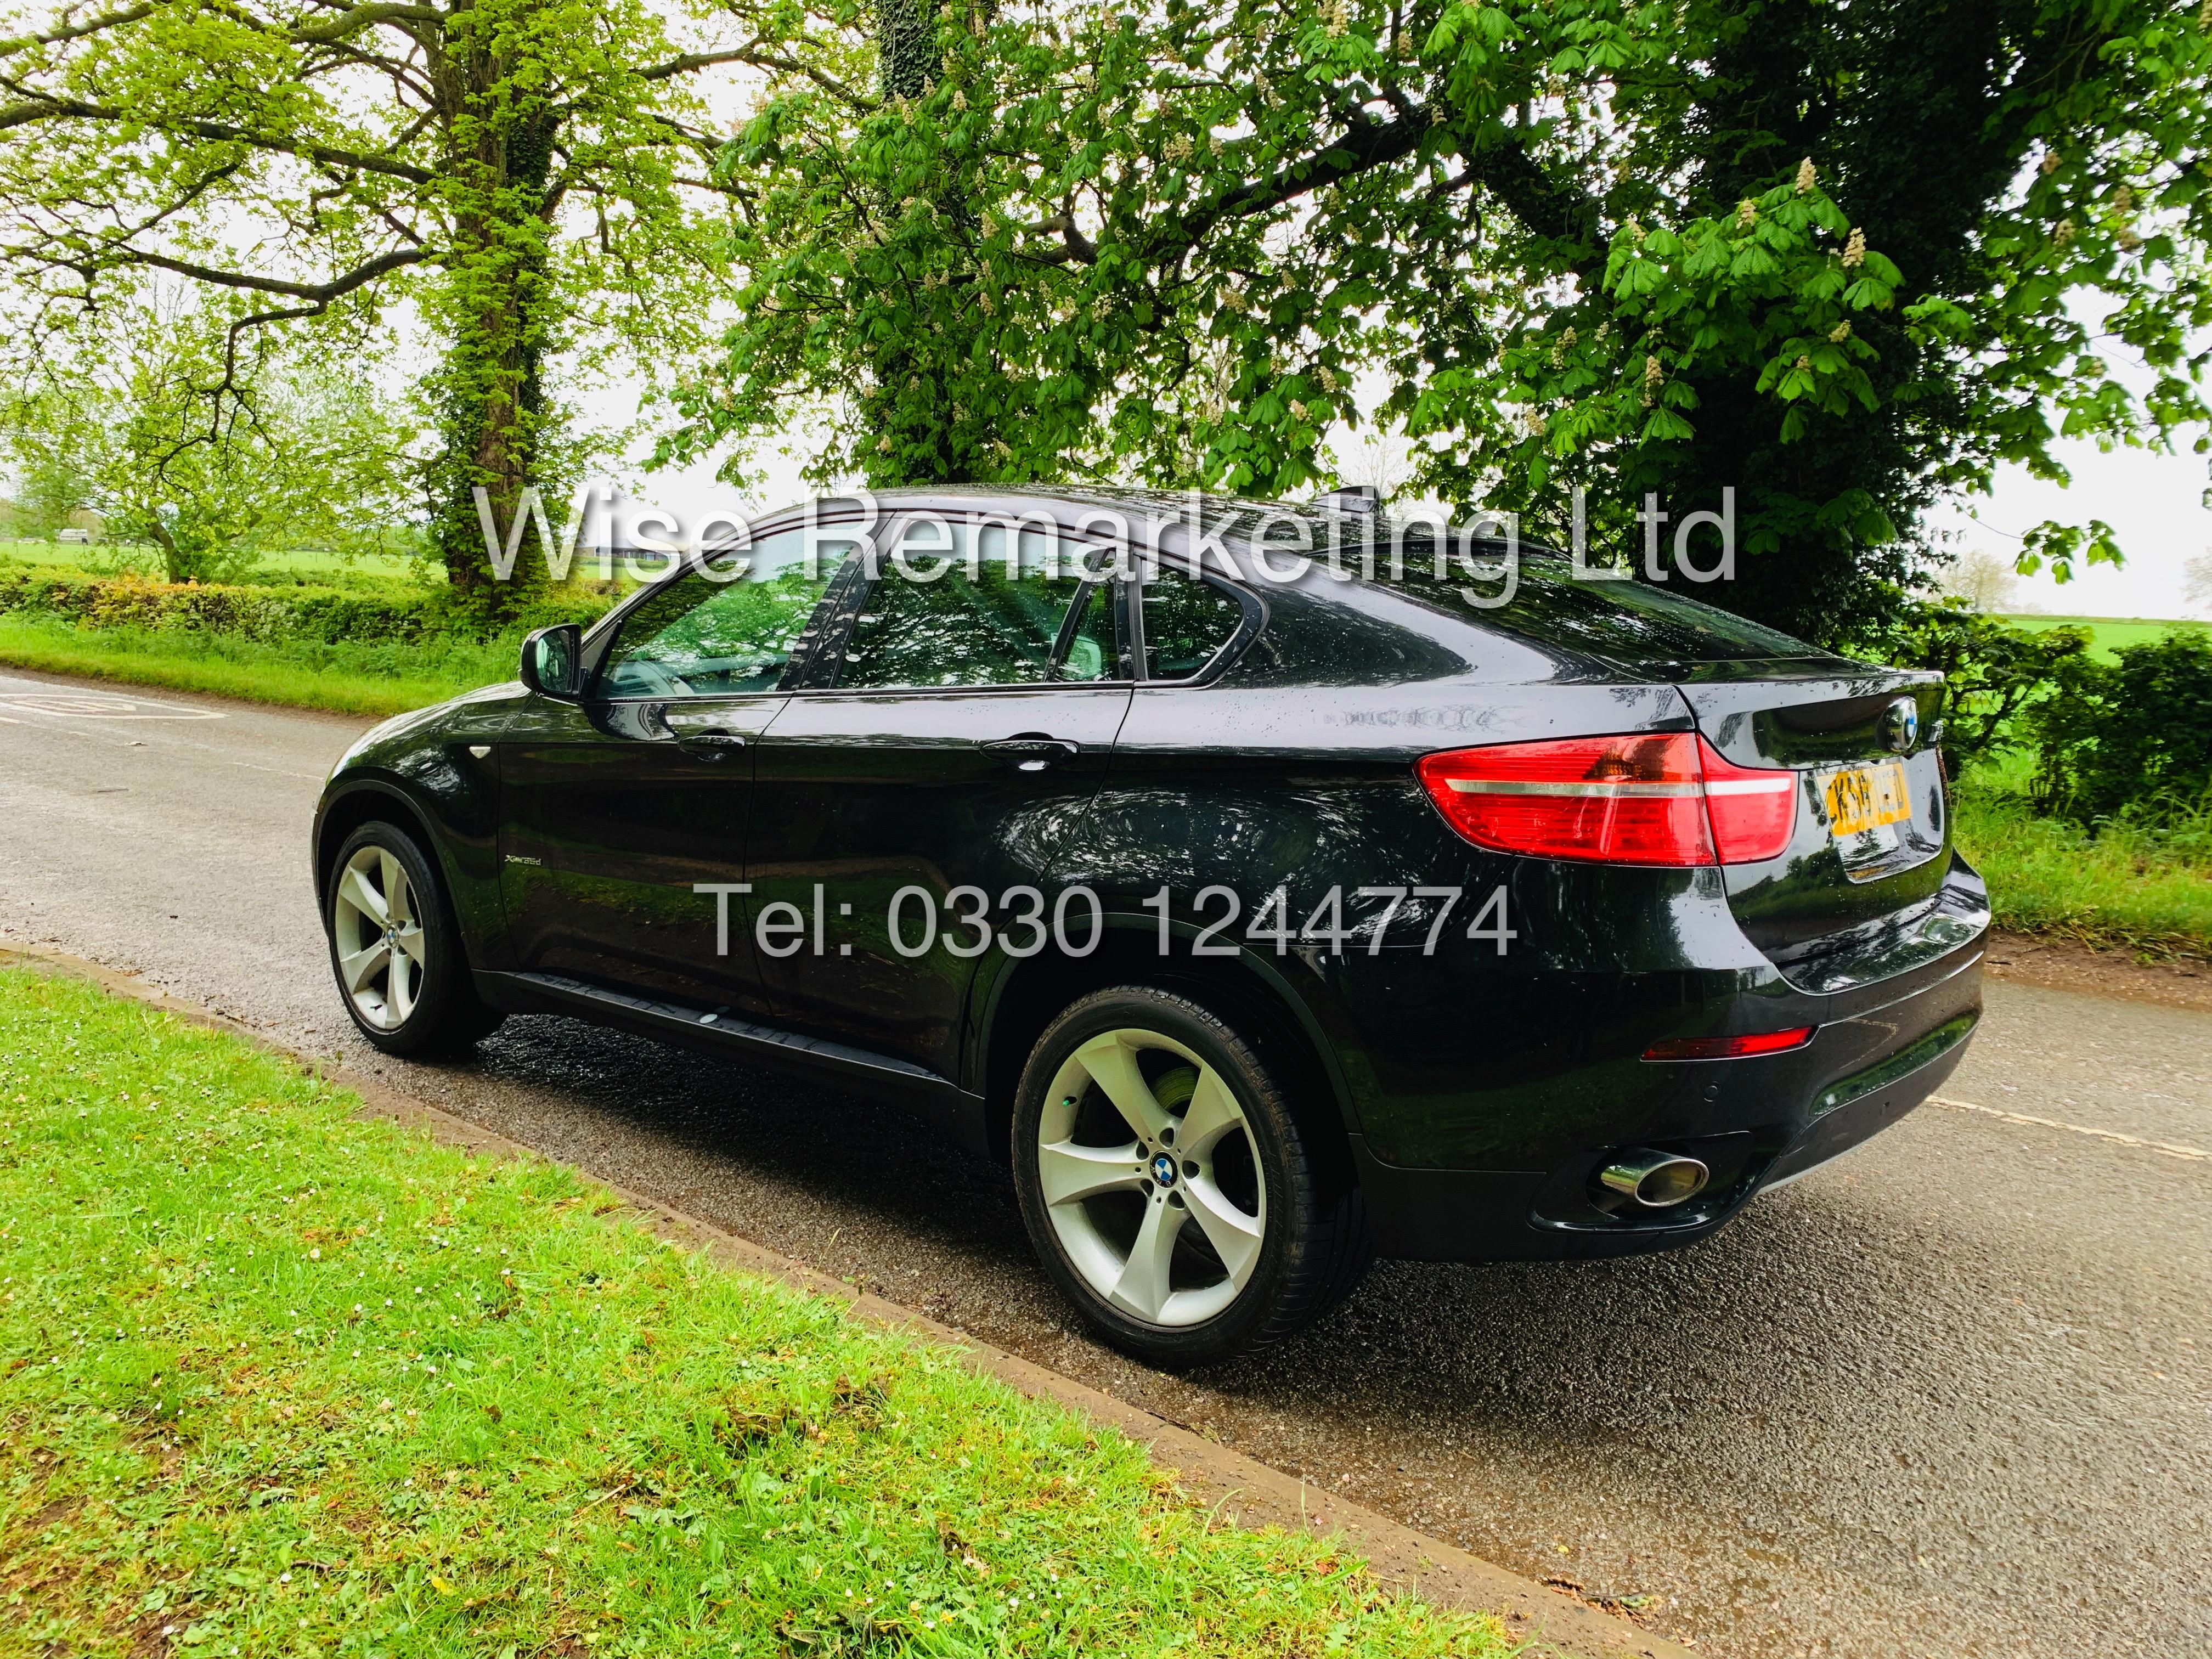 BMW X6 XDRIVE 35D AUTO (2009 SPEC) *1 PREVIOUS OWNER* PARKING AID - SAT NAV - FSH - Image 2 of 25